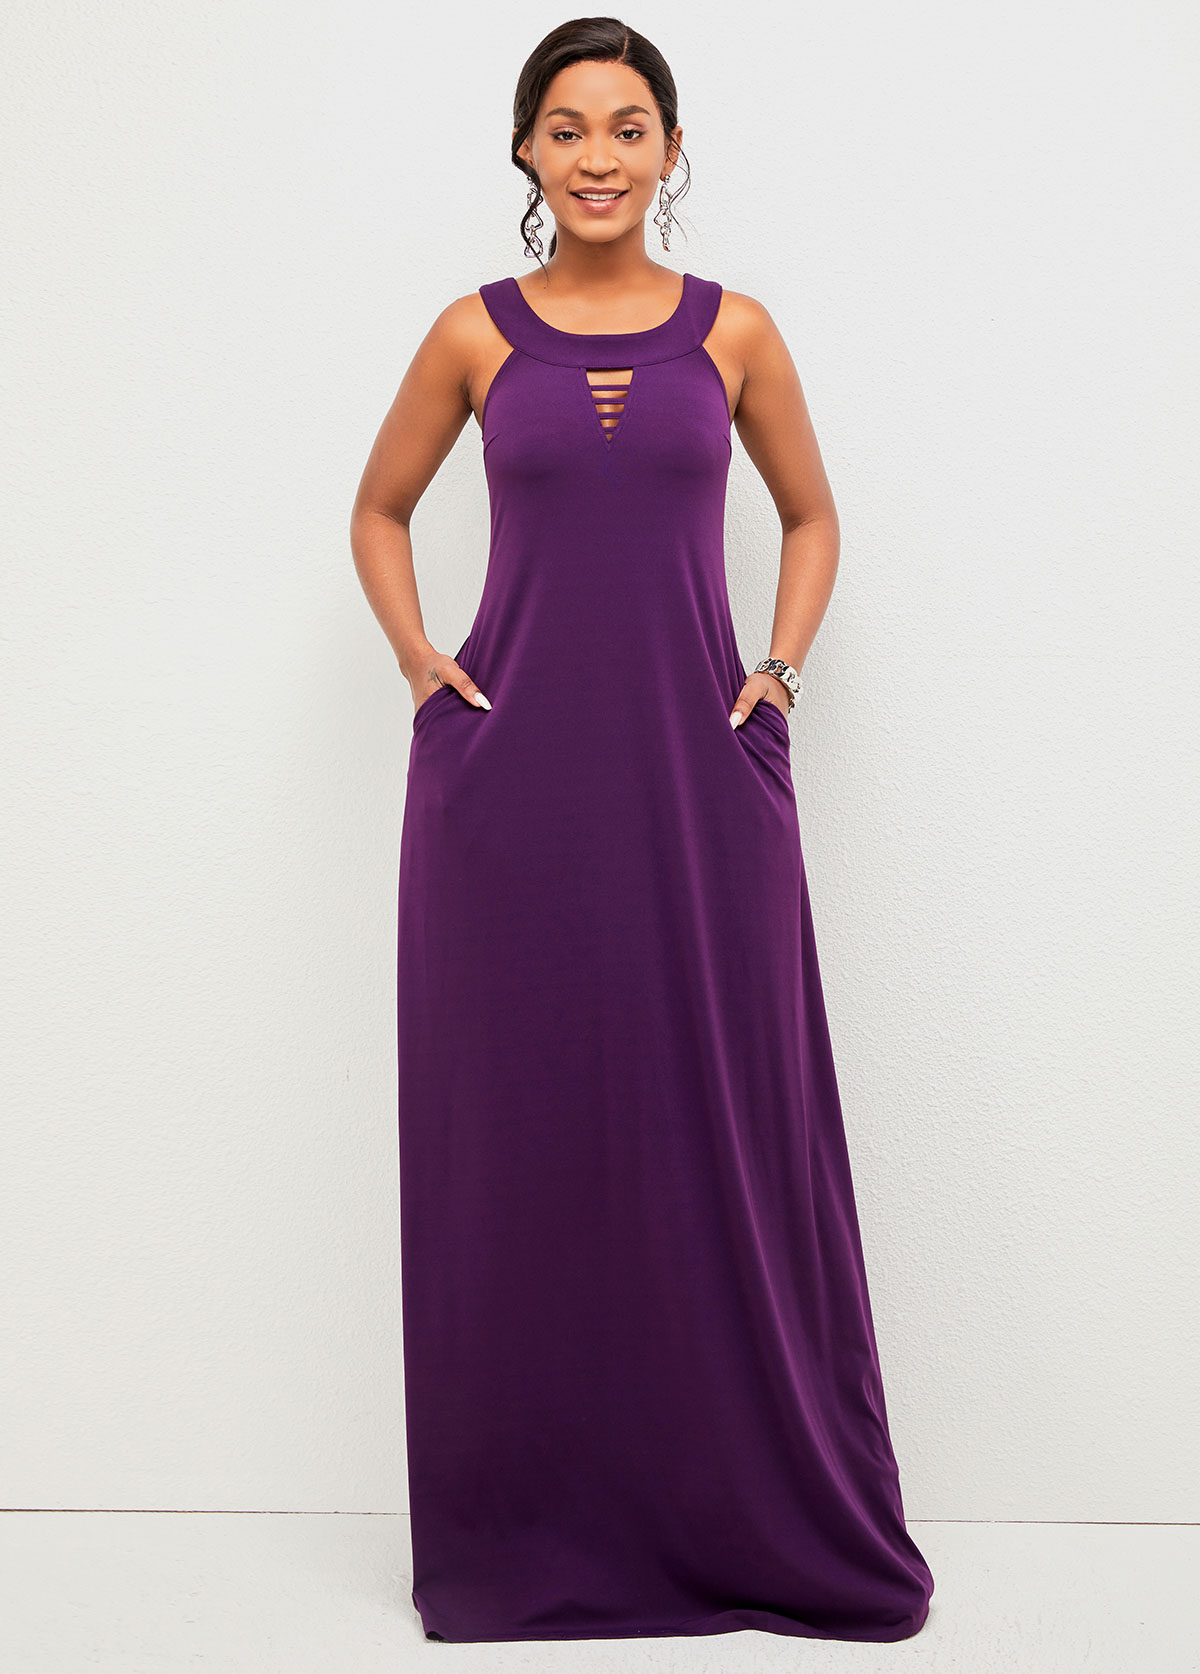 Pocket Detail Ladder Cutout Wide Strap Dress